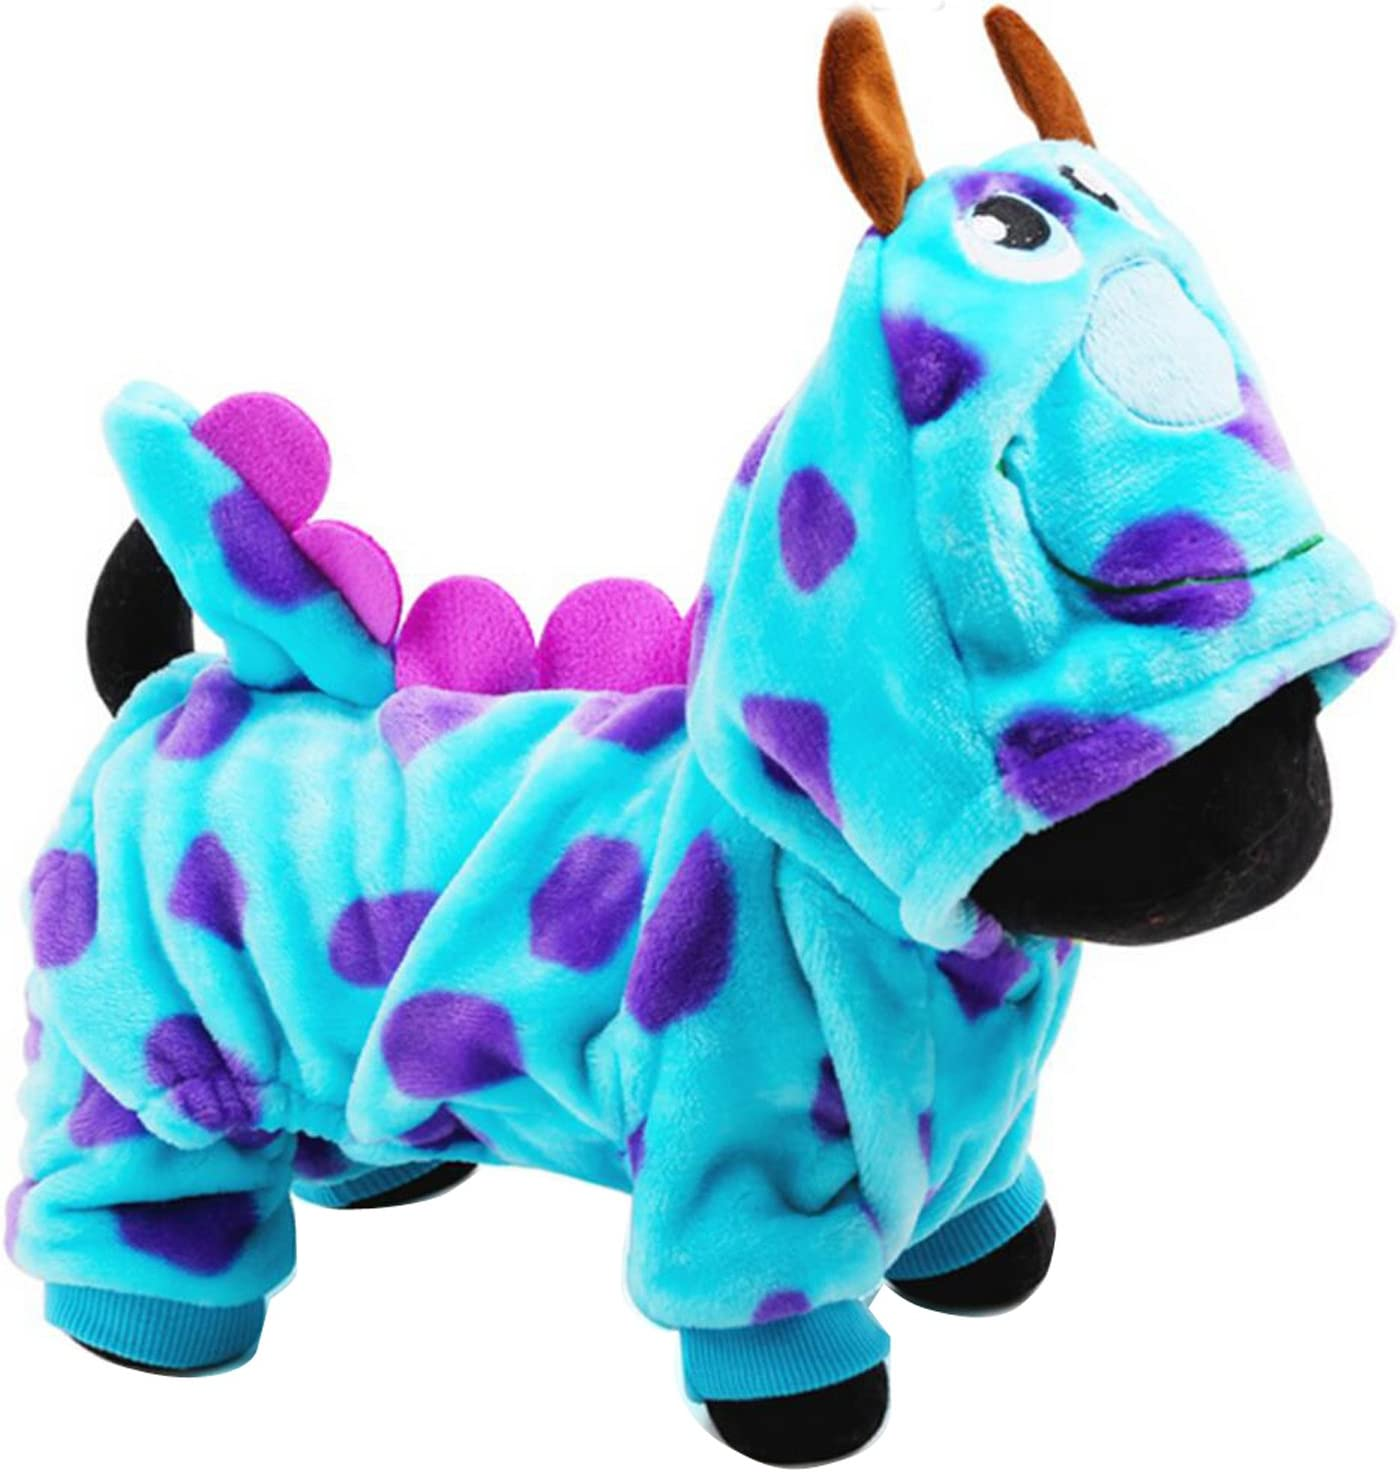 Purple LPATTERN Pet Dog Puppy Coat Halloween Dragon Cosplay Clothing Warm Coat Costume Outwear Apparel